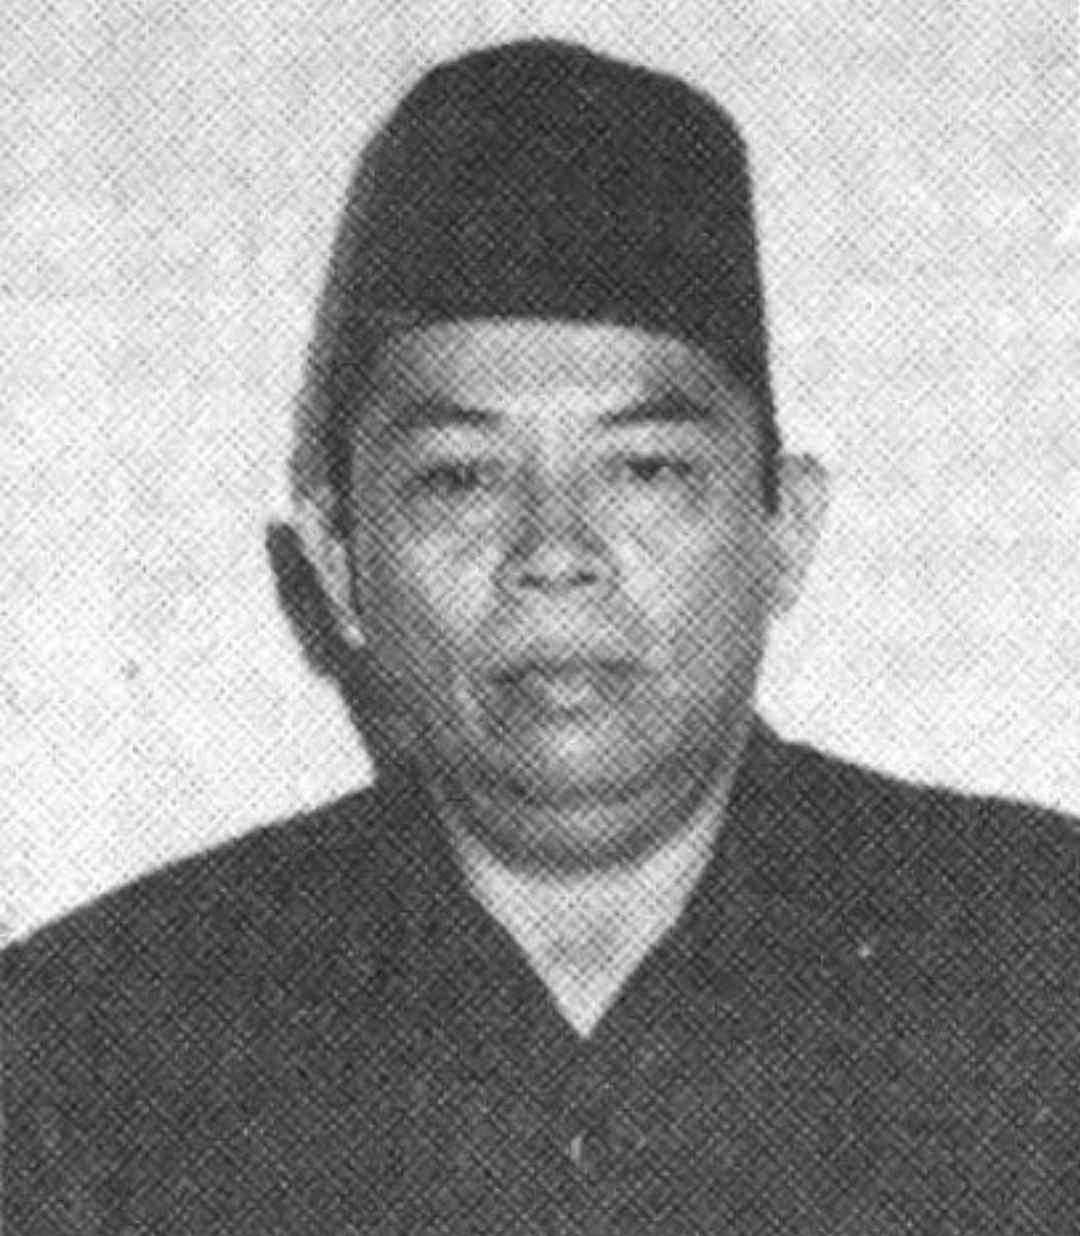 Ahmad Lamo, Gubernur Terlama Sulawesi Selatan asal Enrekang